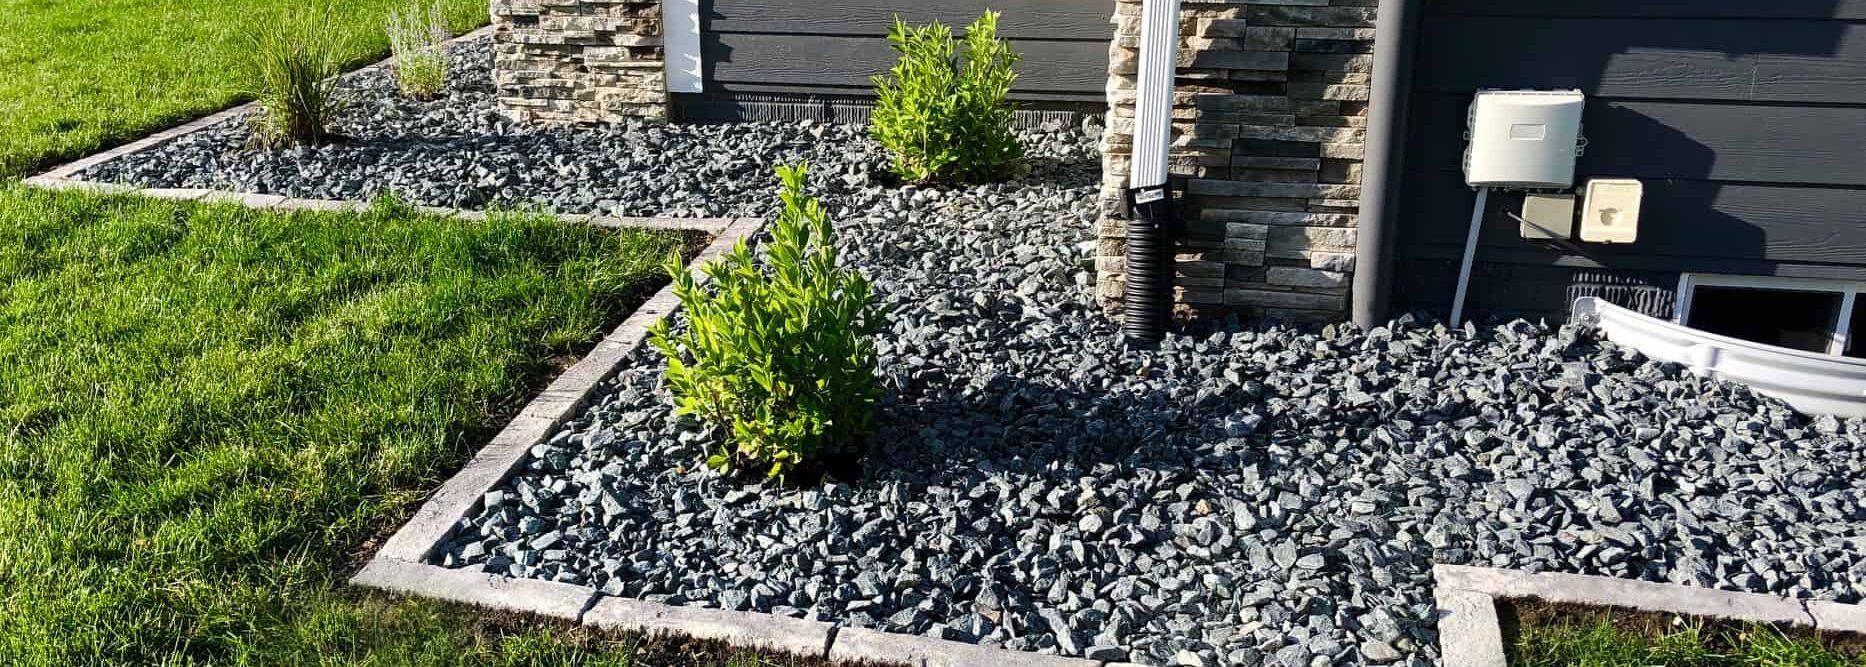 landscaping edging in Rosetta Bordo